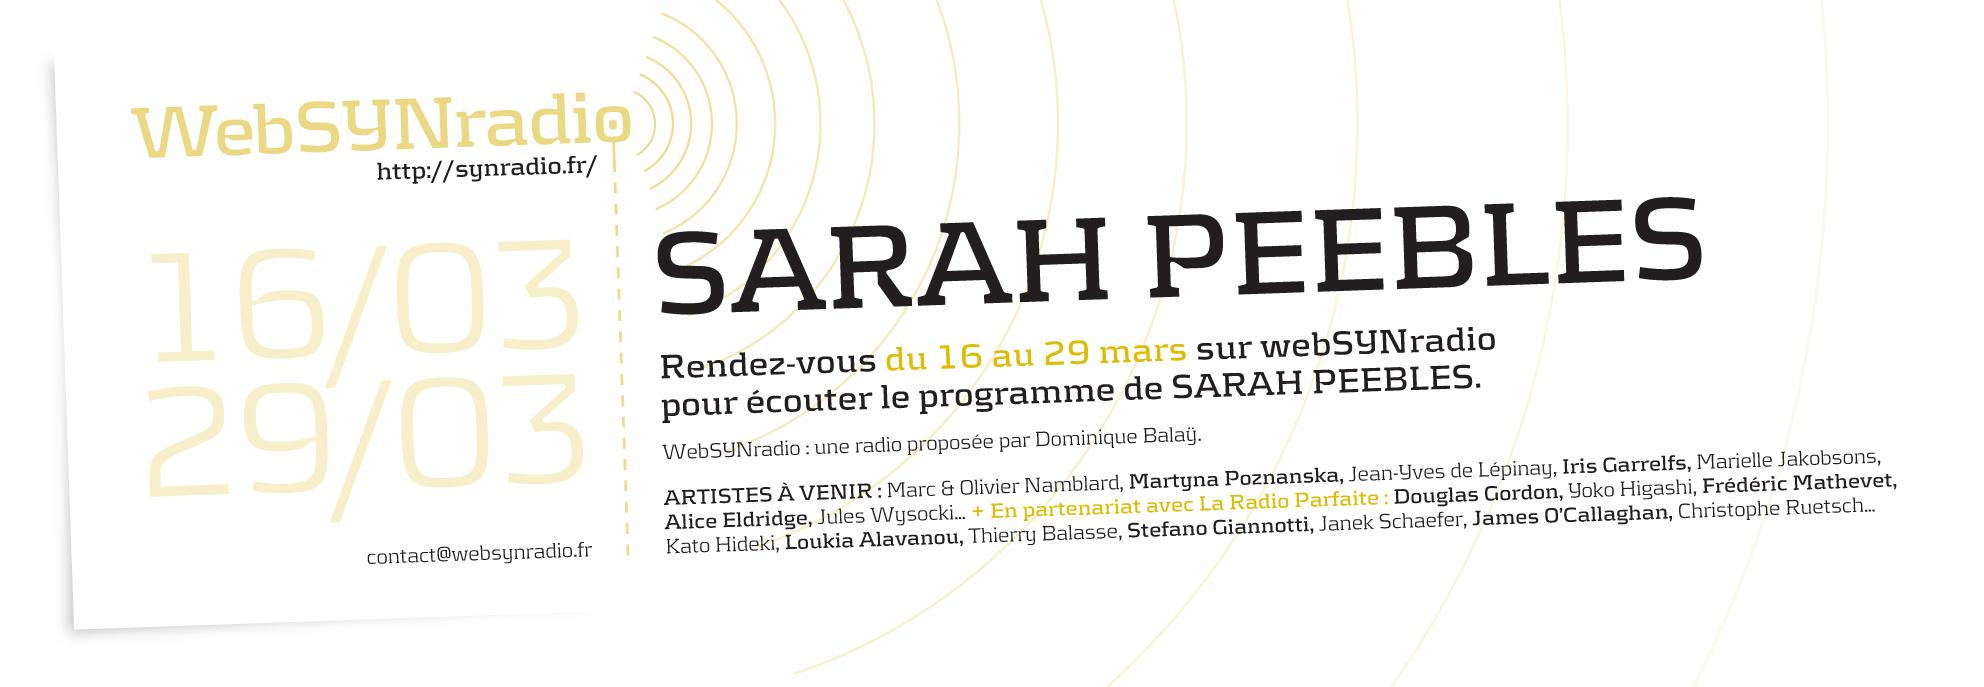 Sarah-Peebles